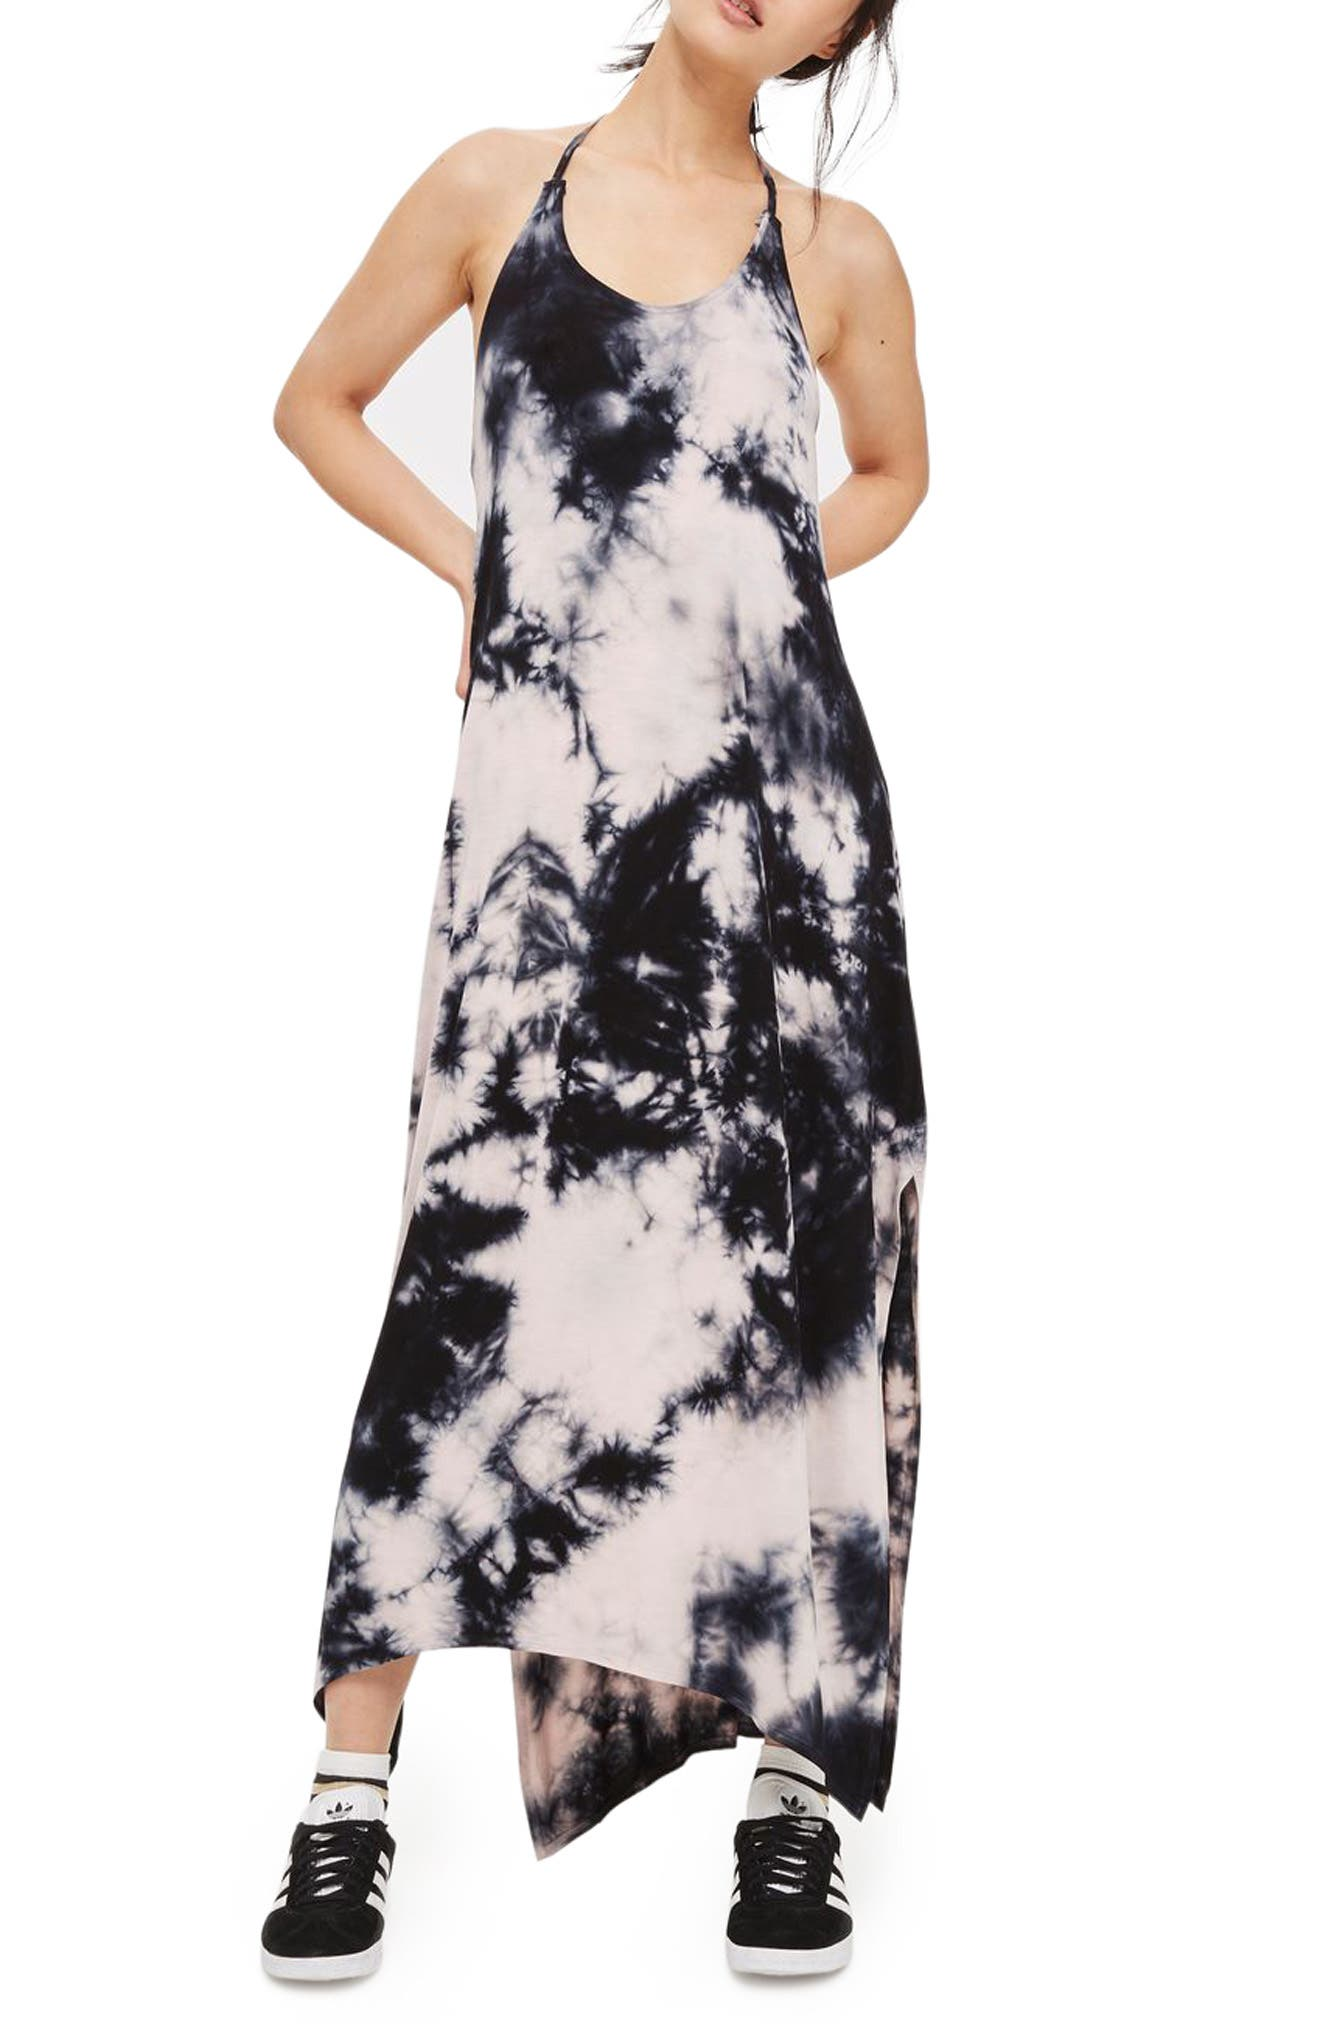 Topshop Tie Dye Halter Maxi Dress